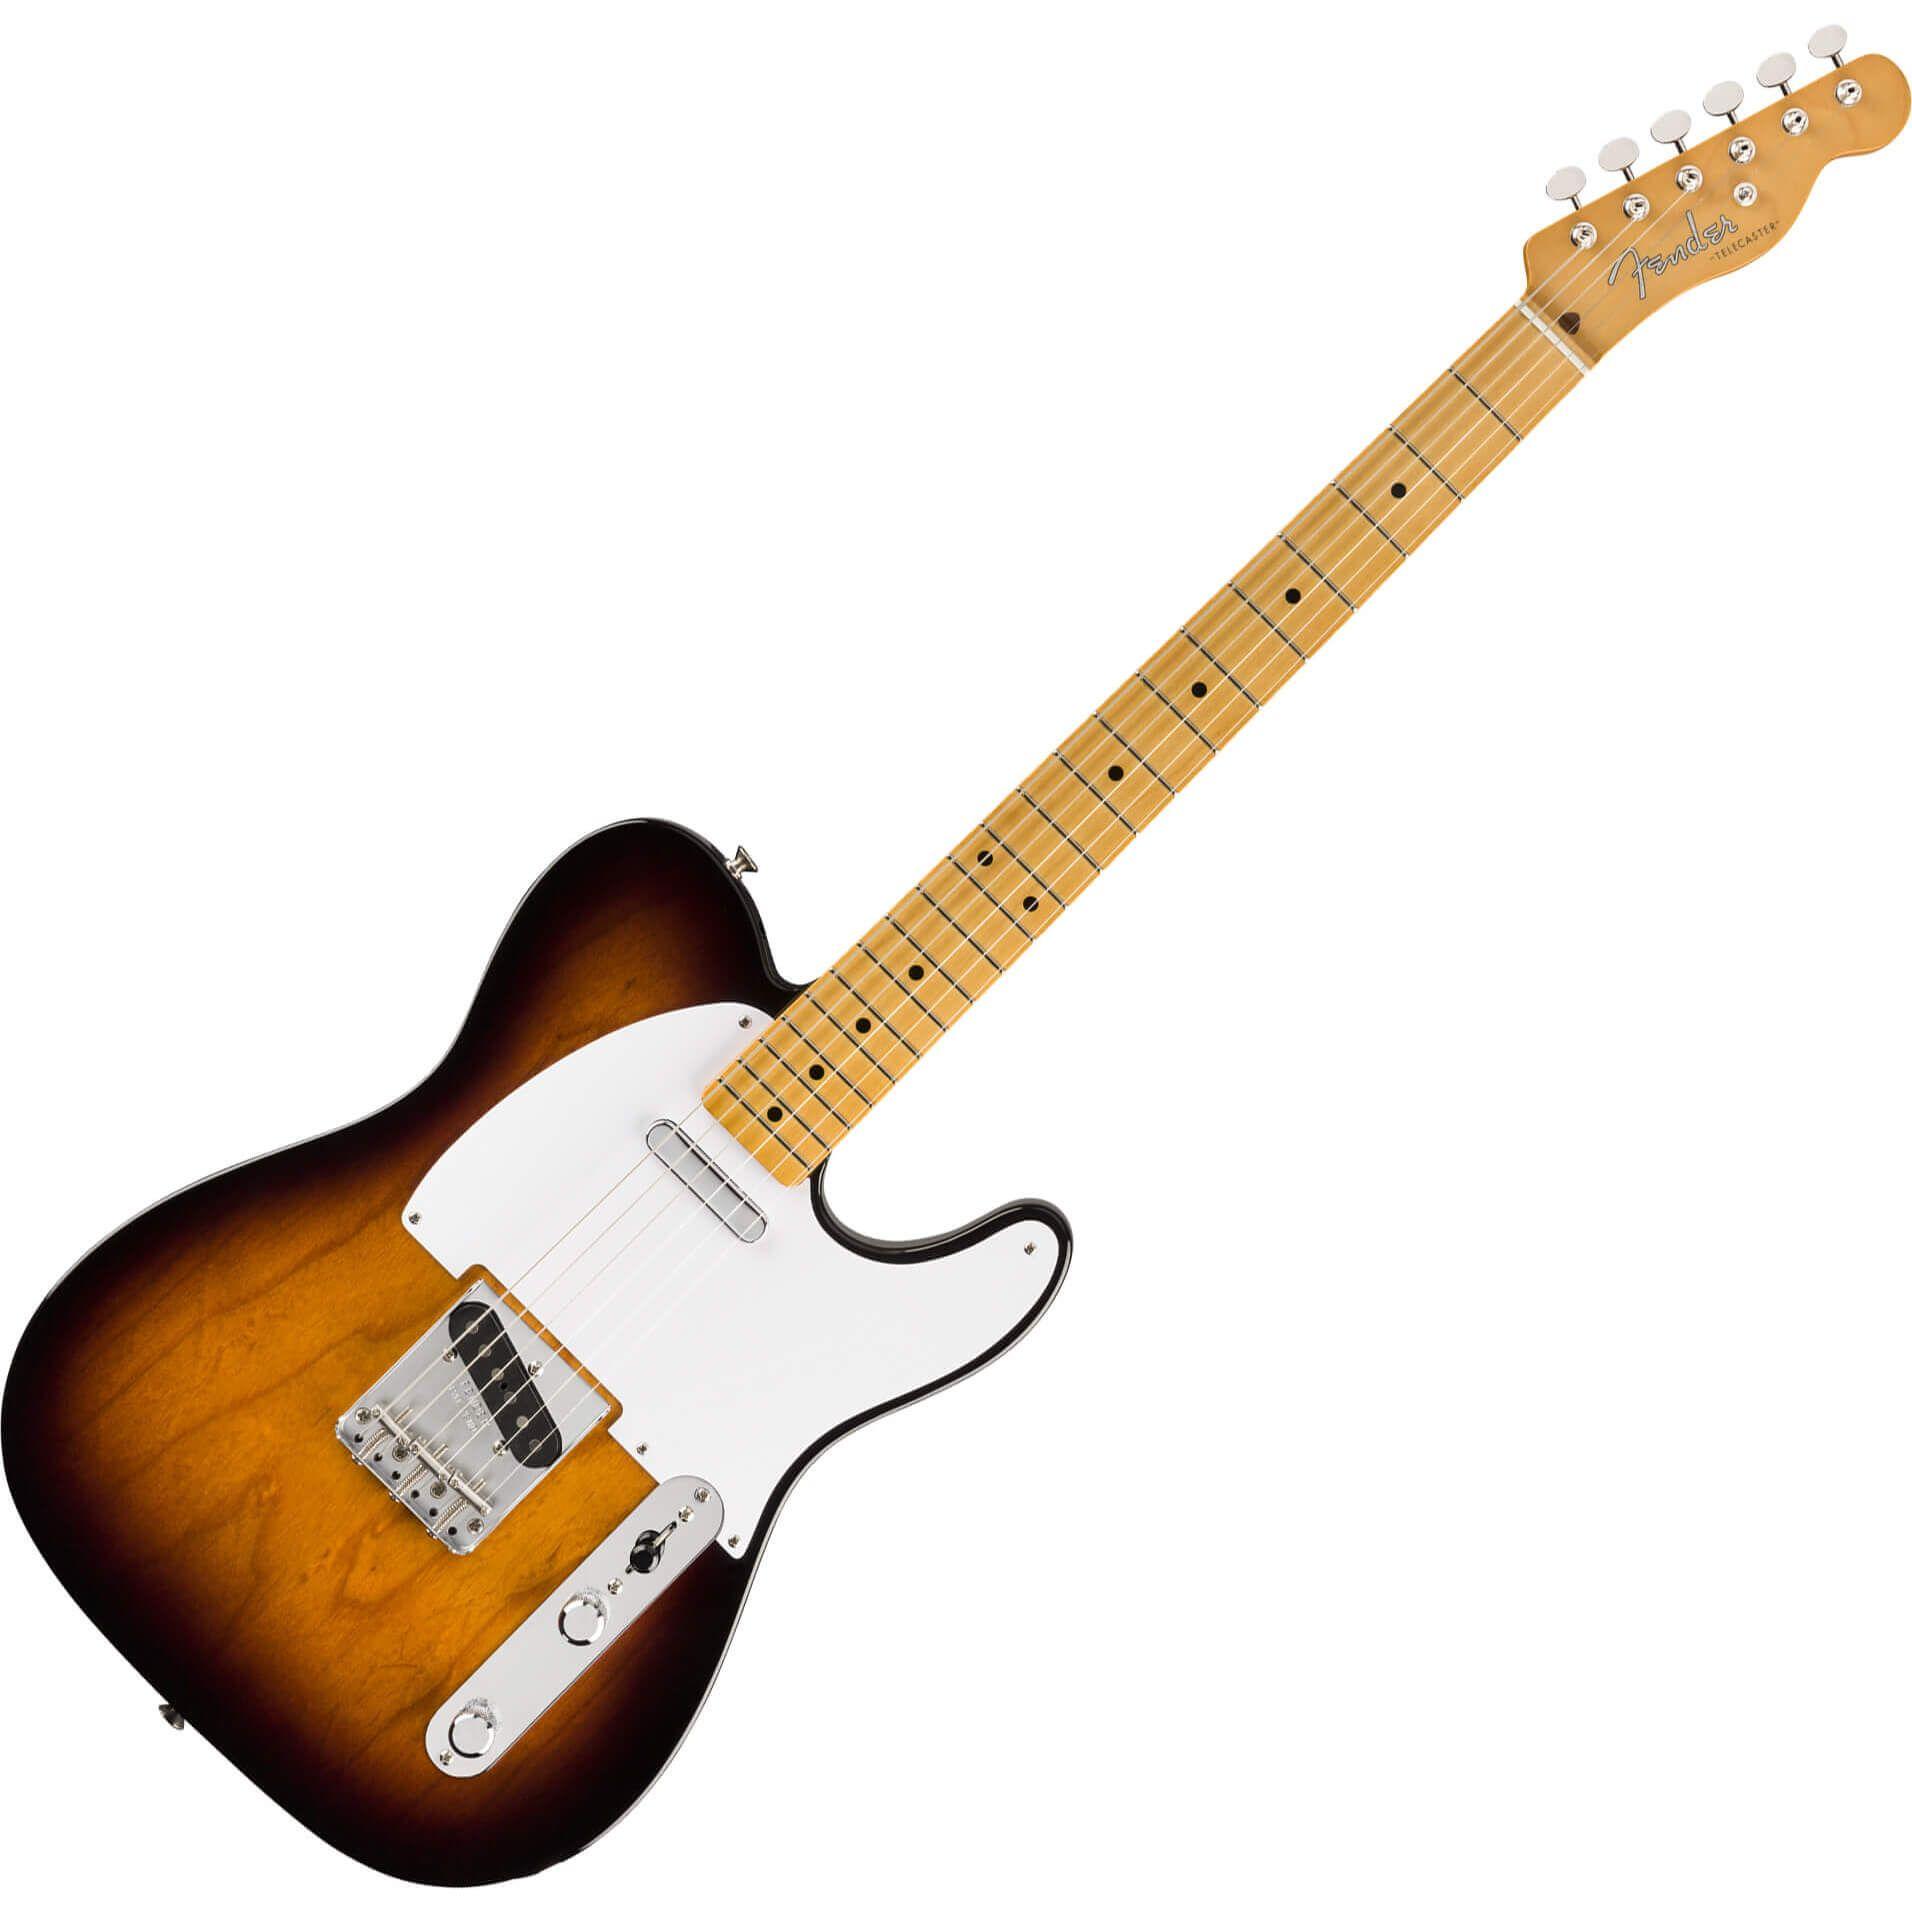 Fender Vintera Series 50s Telecaster - MN - 2-Tone Sunburst